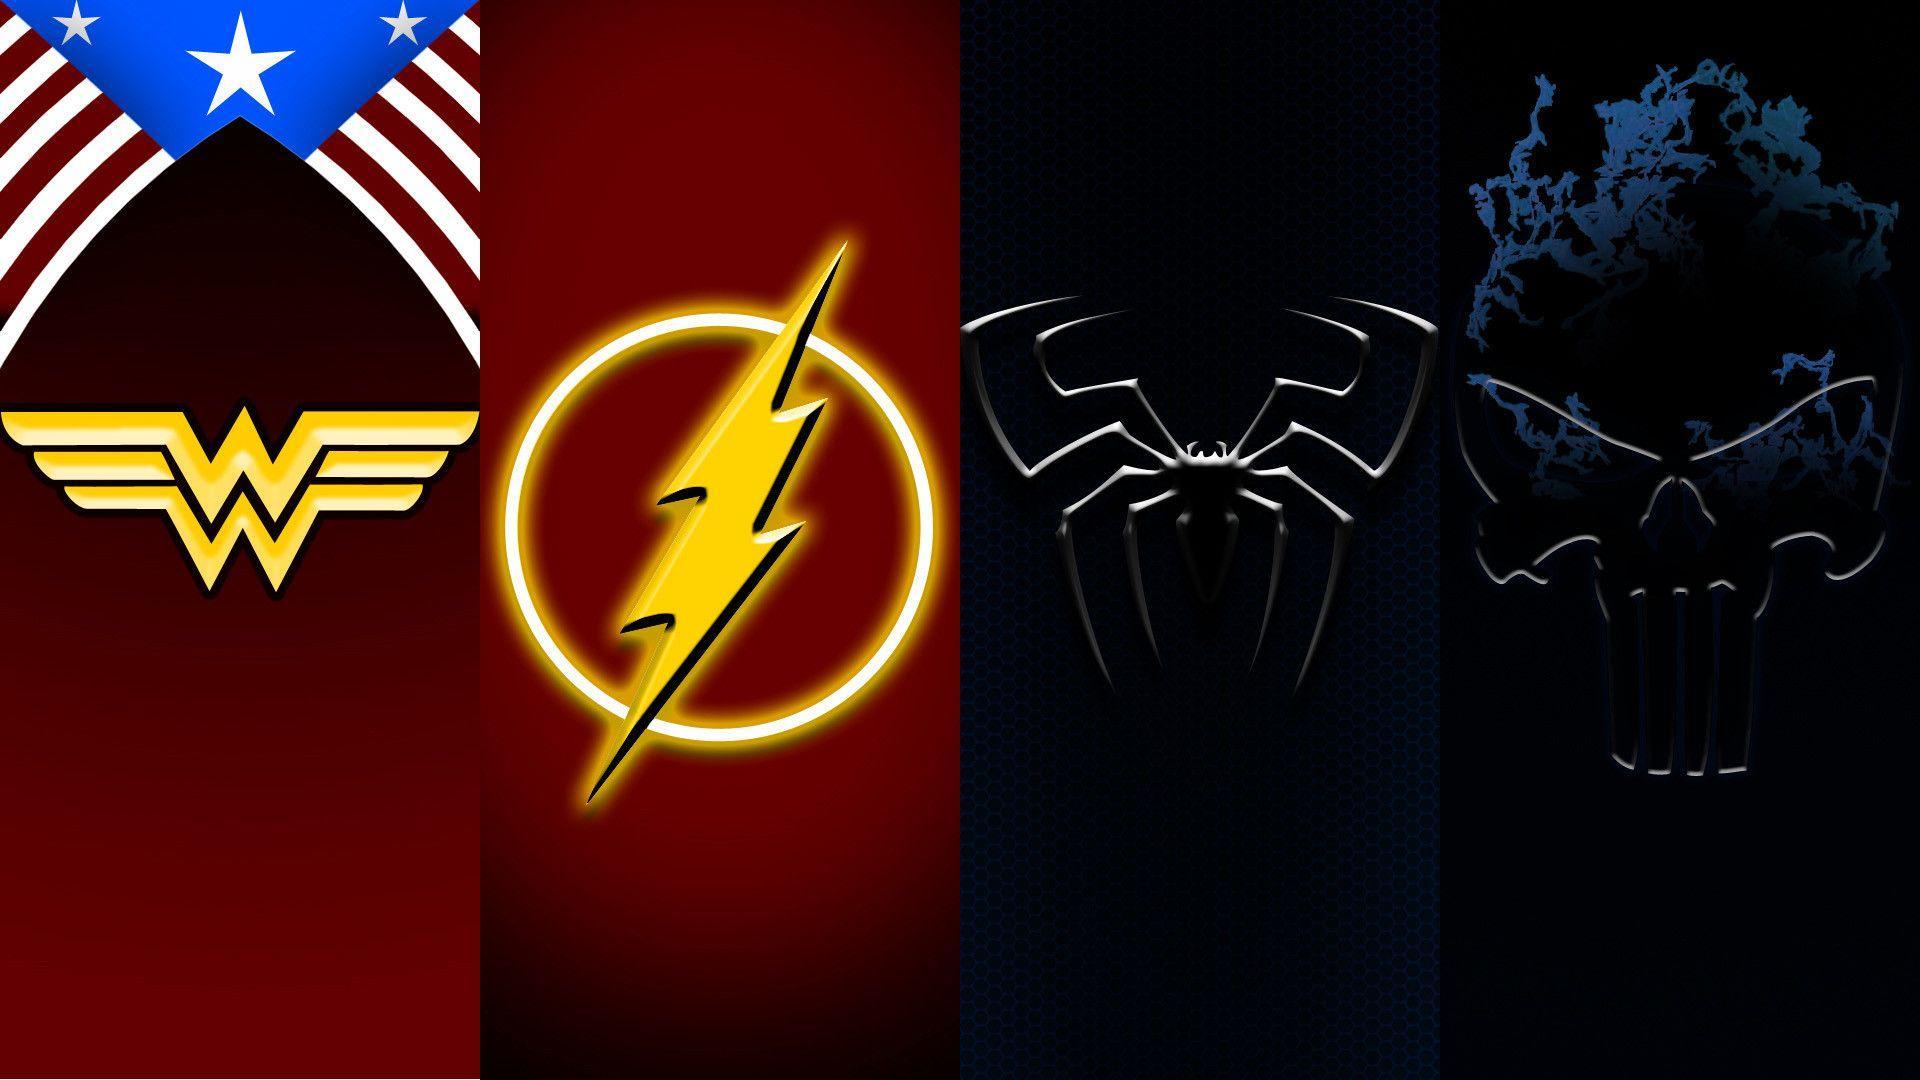 Flash And Wonder Woman Symbol Symbols Free Download